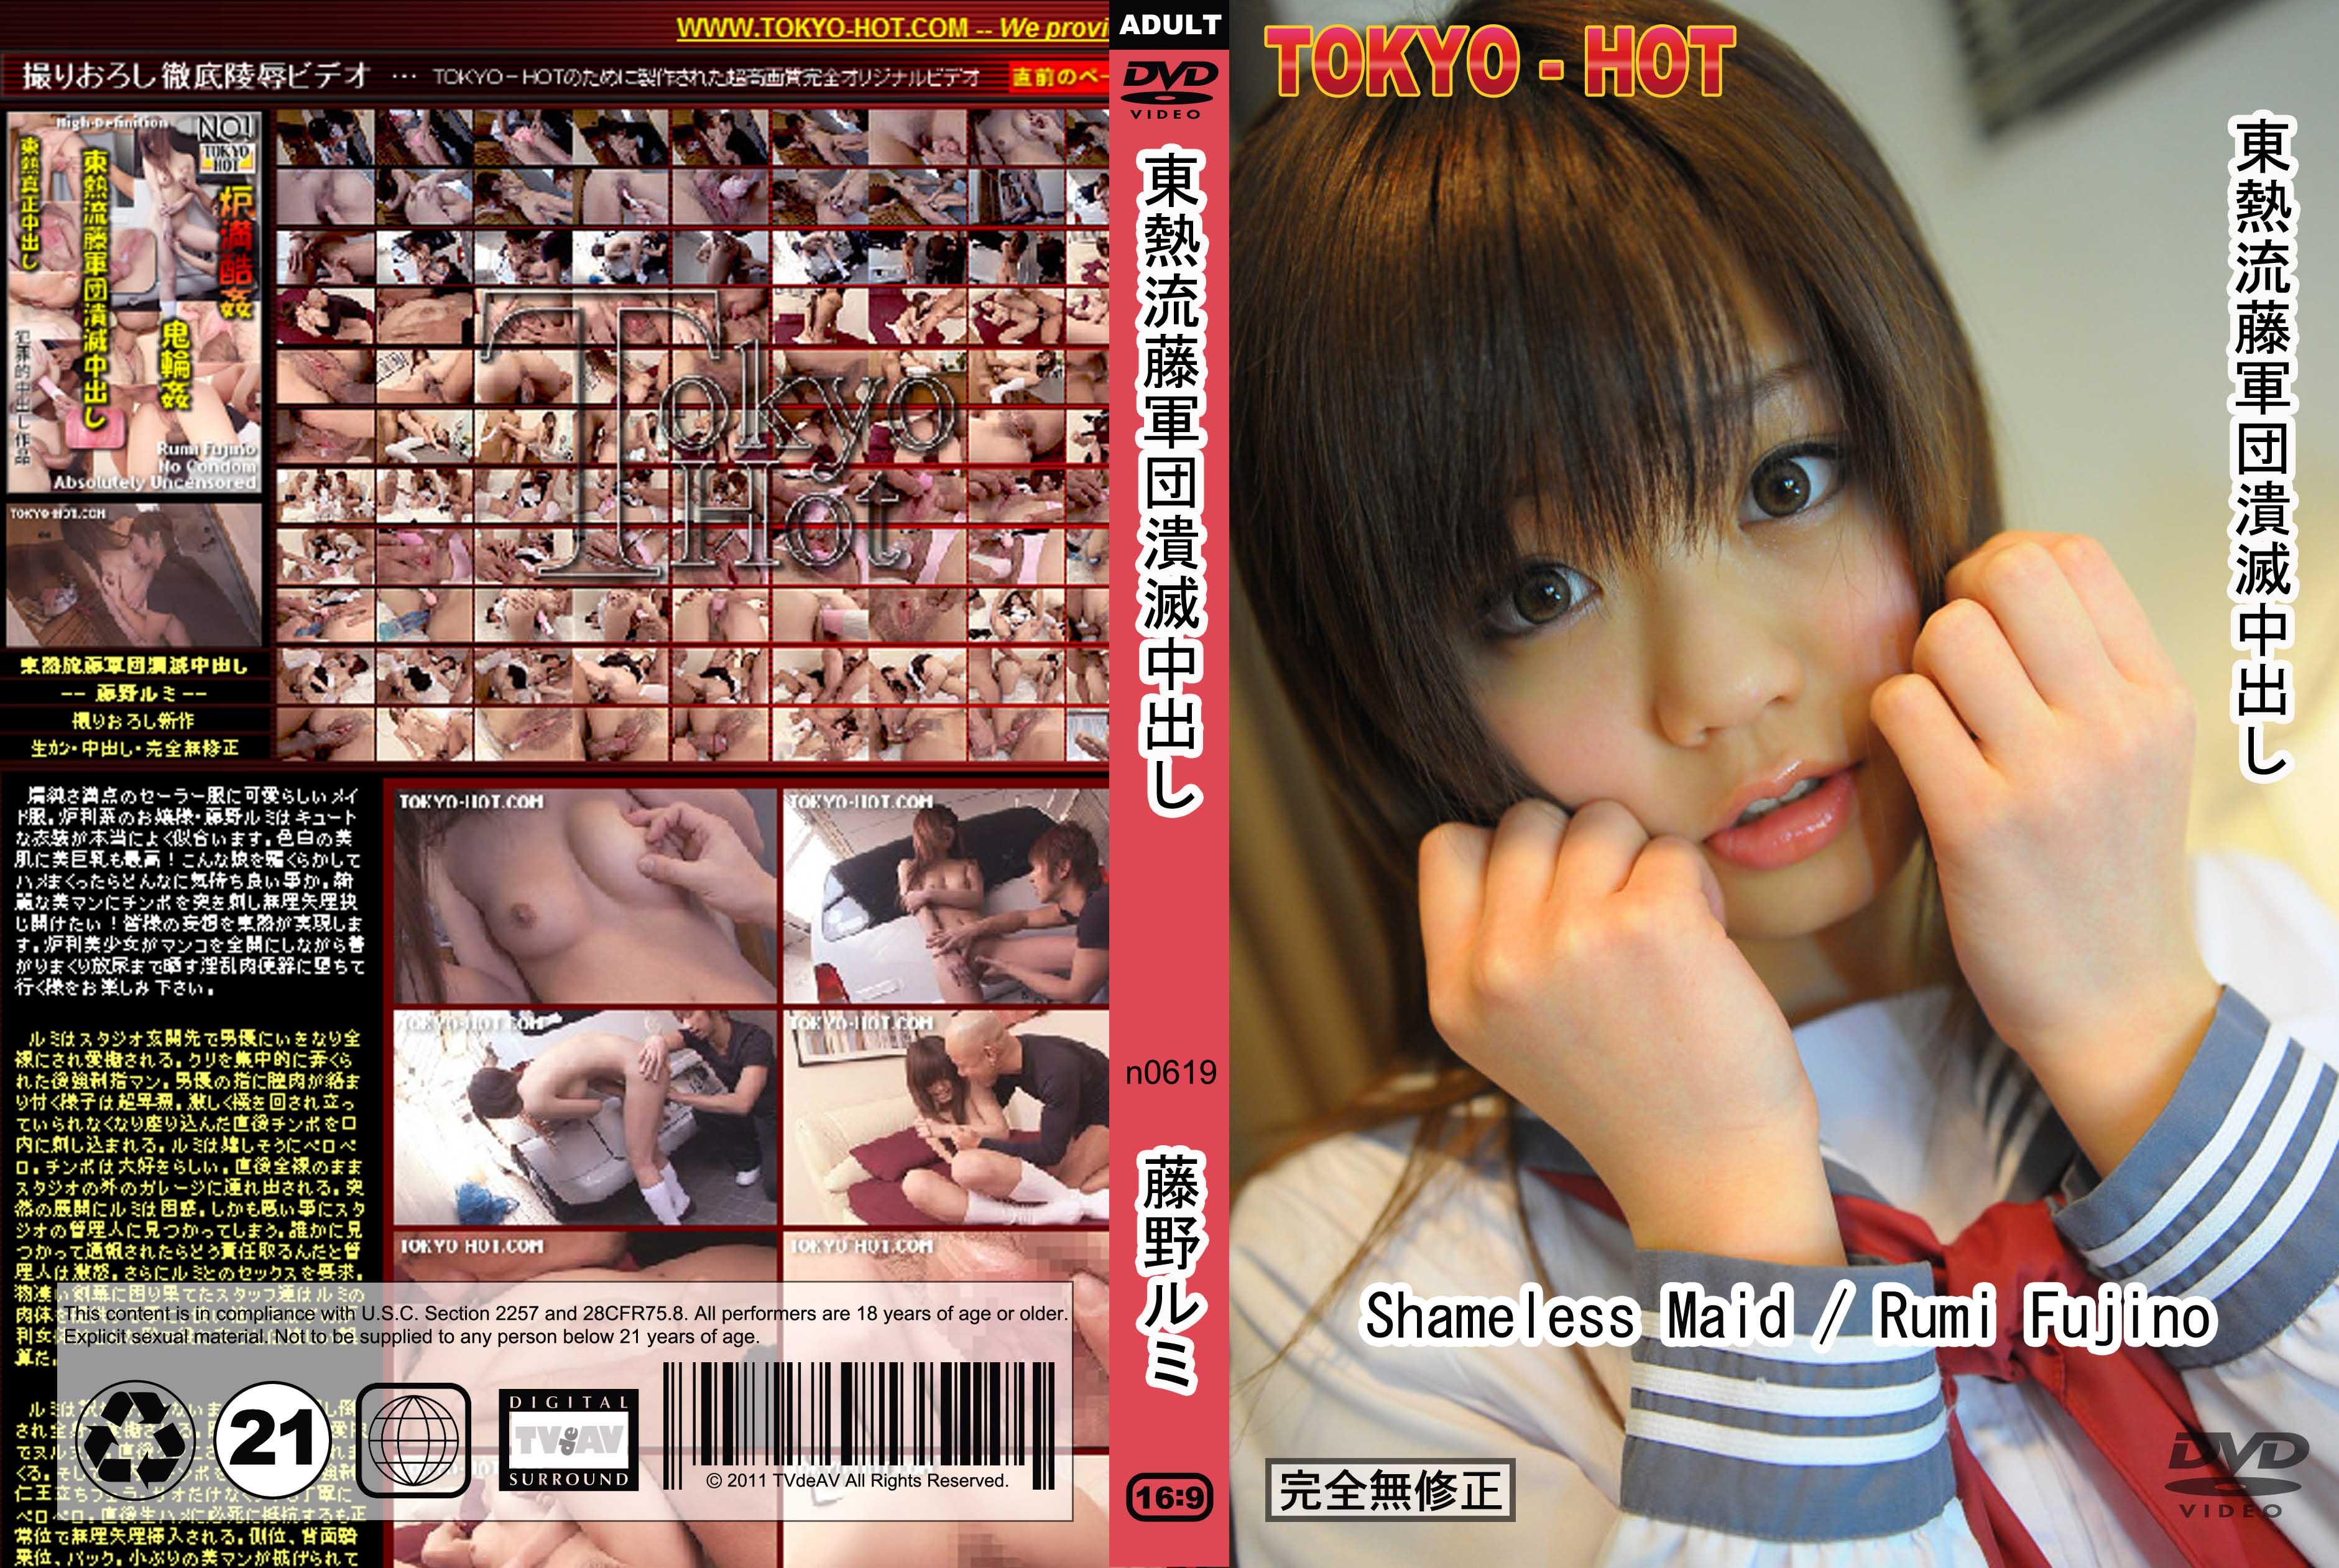 tokyo-hot-n0619-cd1-東熱流藤軍団潰滅中出し